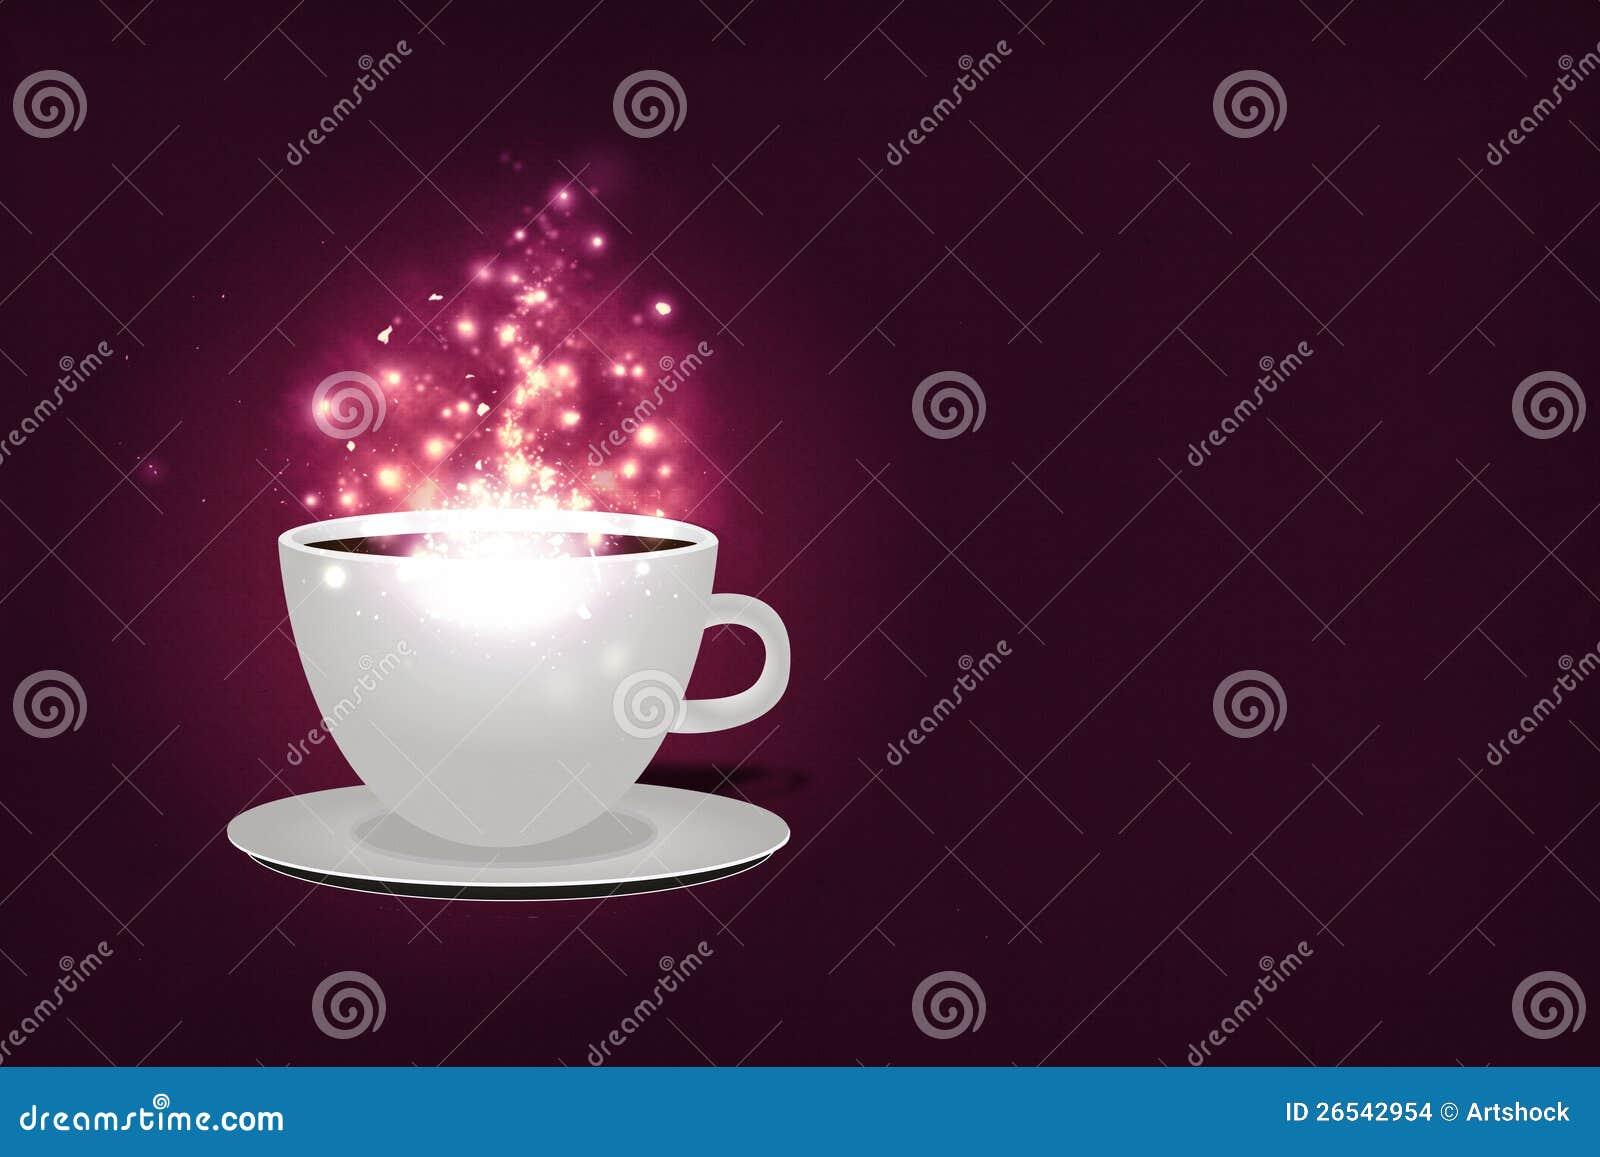 Magic Coffee Background Stock Images - Image: 26542954